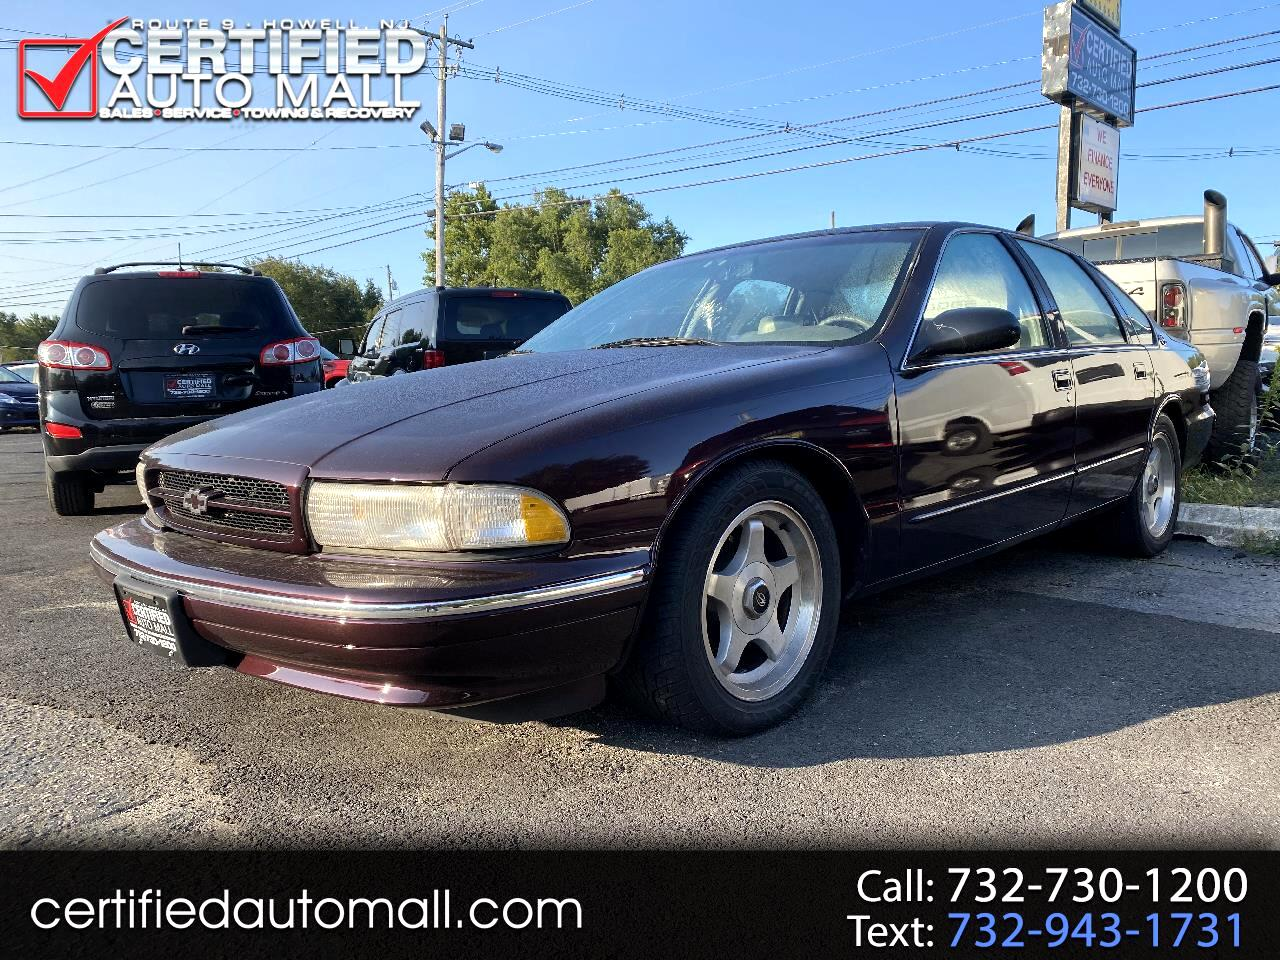 Chevrolet Caprice Classic/Impala SS 4dr Sedan 1995